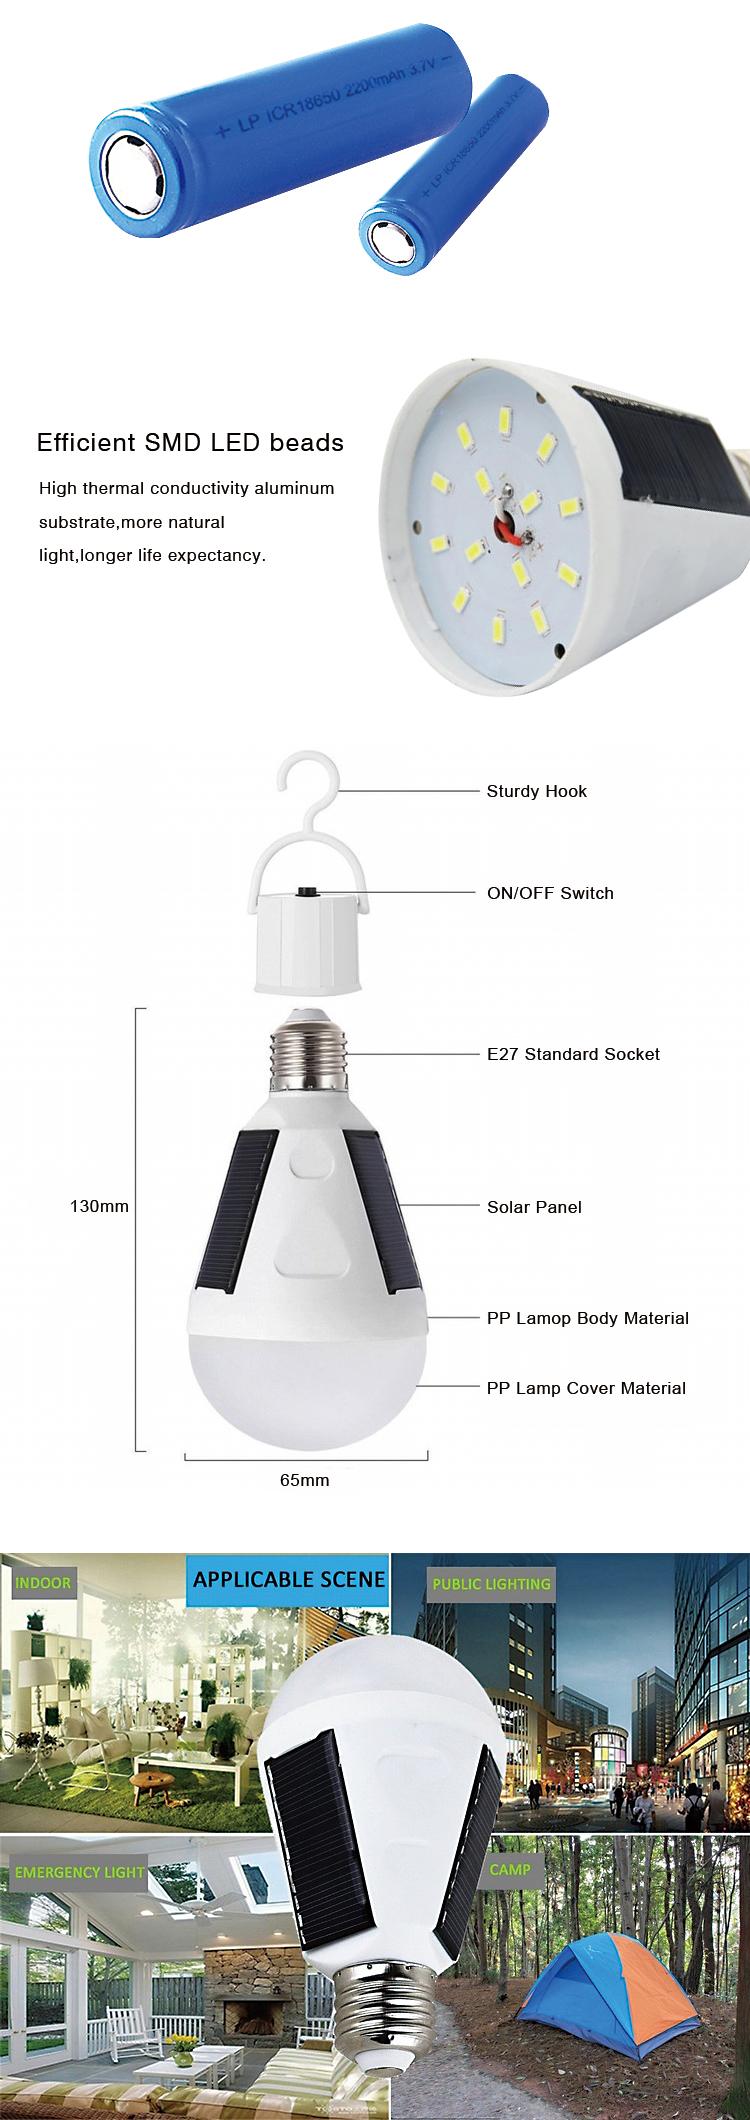 solar-LED-bulb_02.jpg